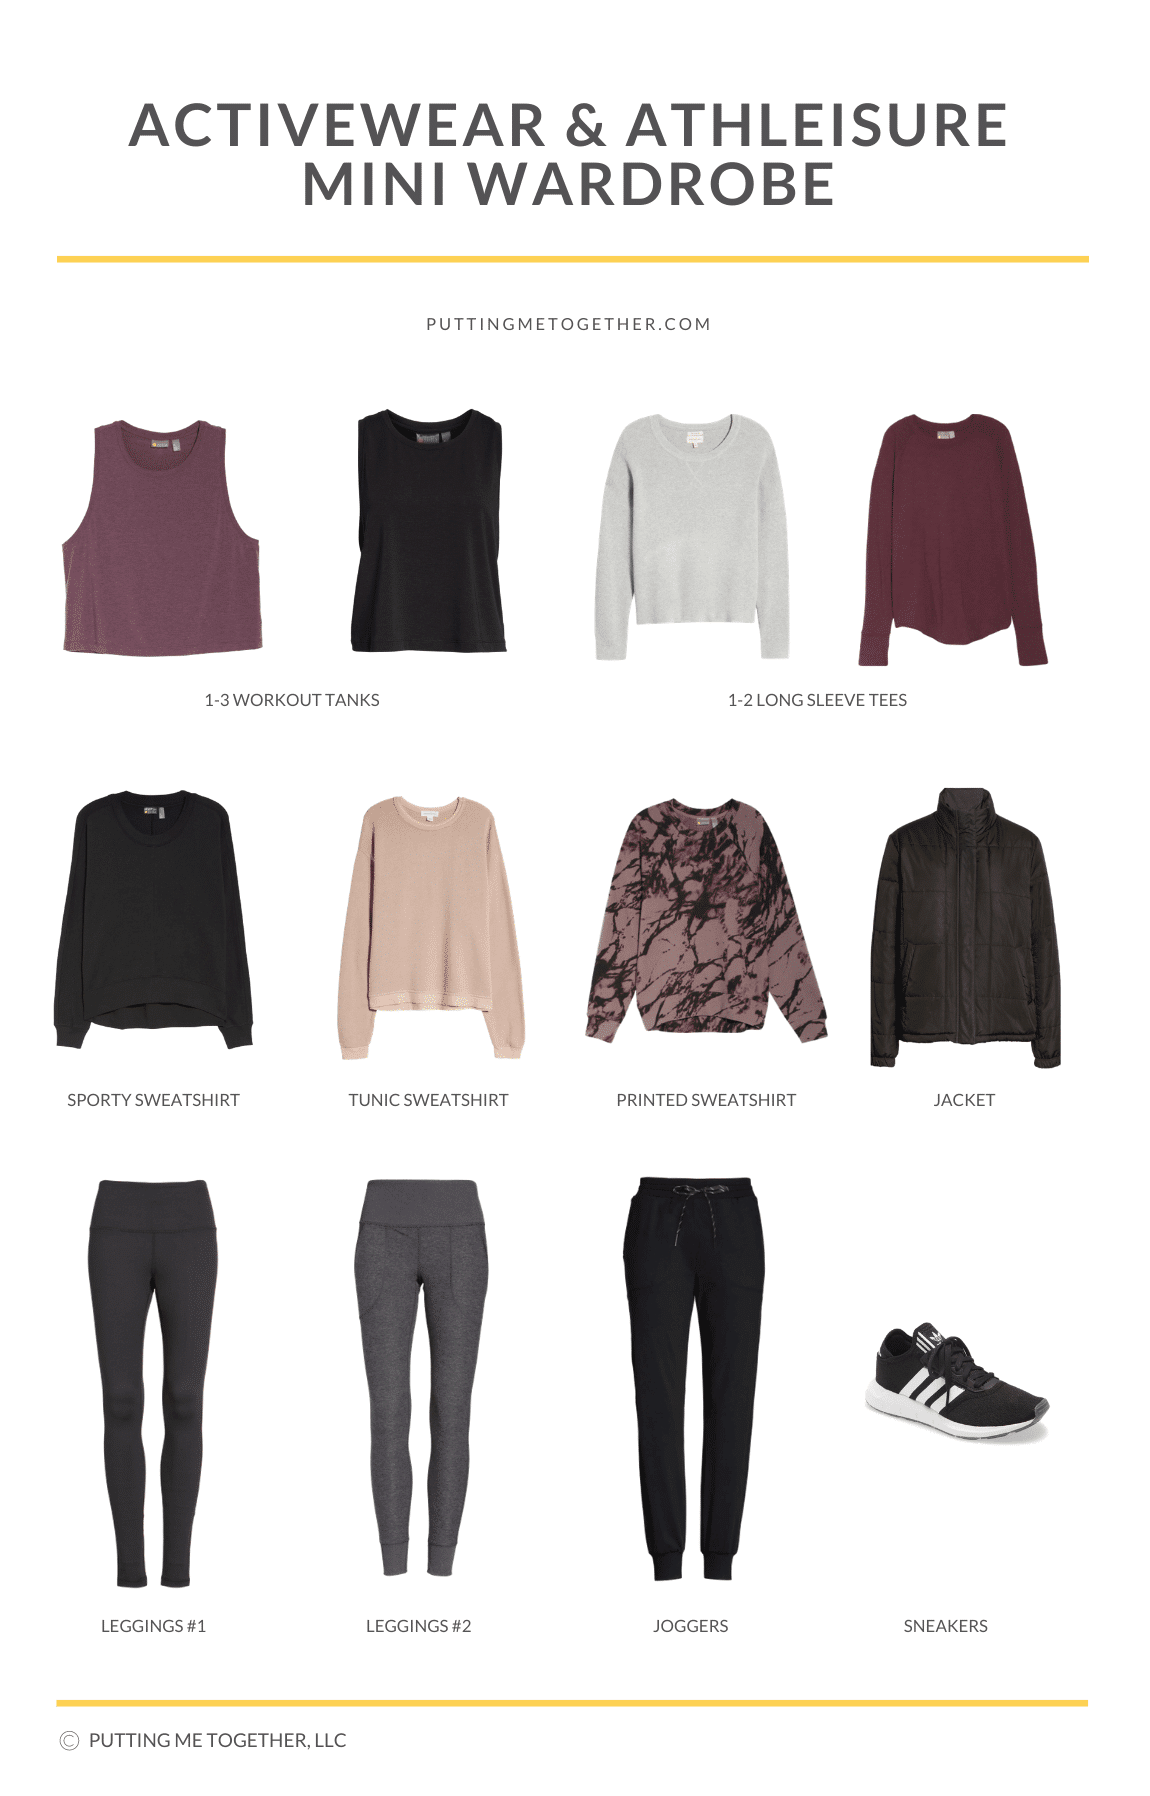 Activewear & Athleisure Capsule Wardrobe